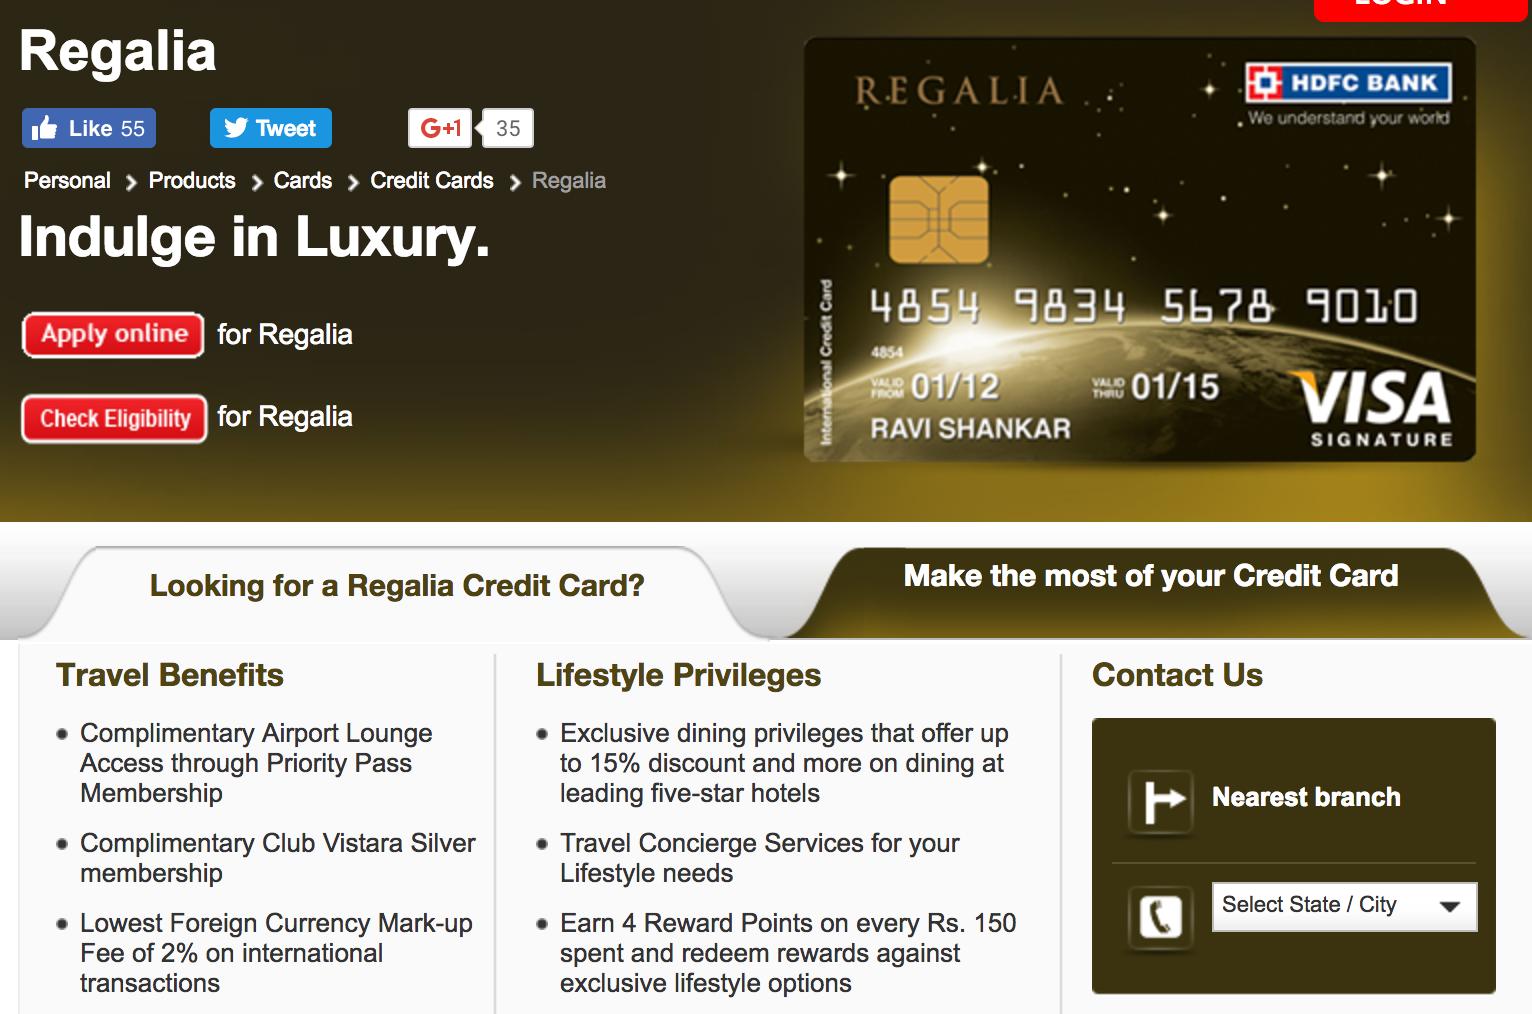 Hdfc regalia forex plus card benefits